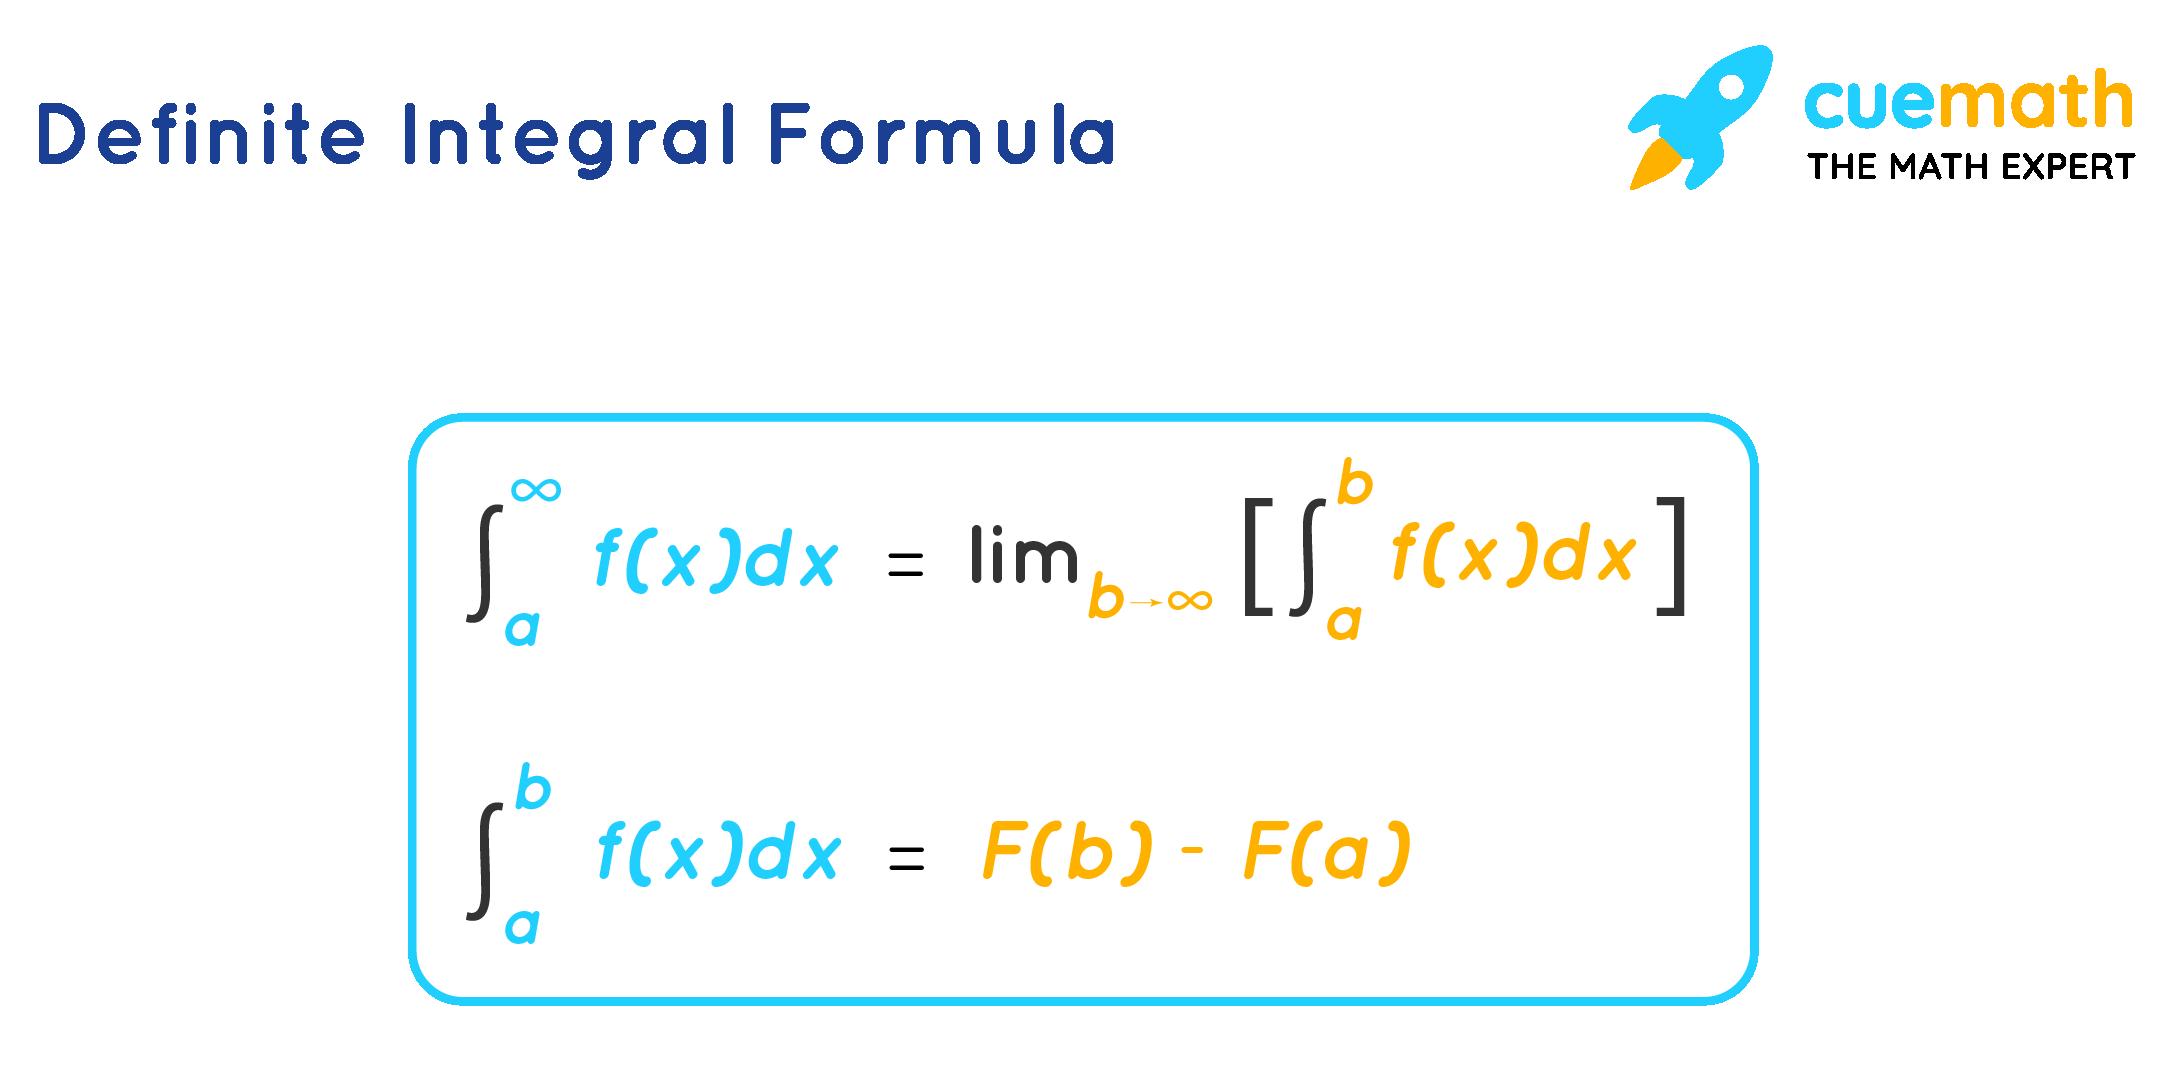 Definite Integral Formula